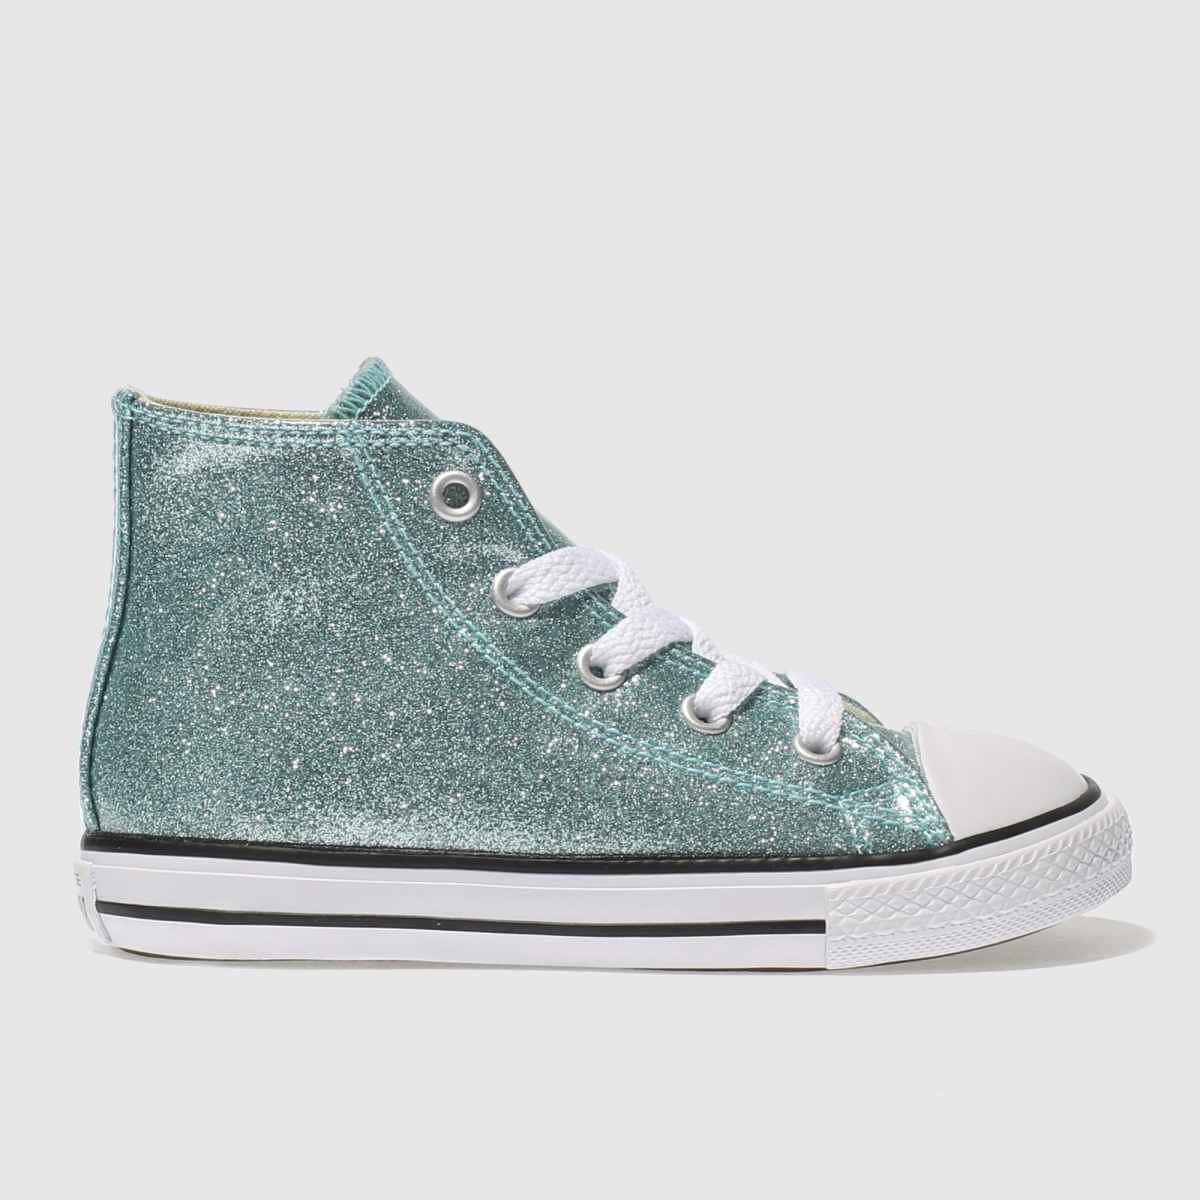 Converse Pale Blue All Star Hi Glitter Girls Toddler Trainers